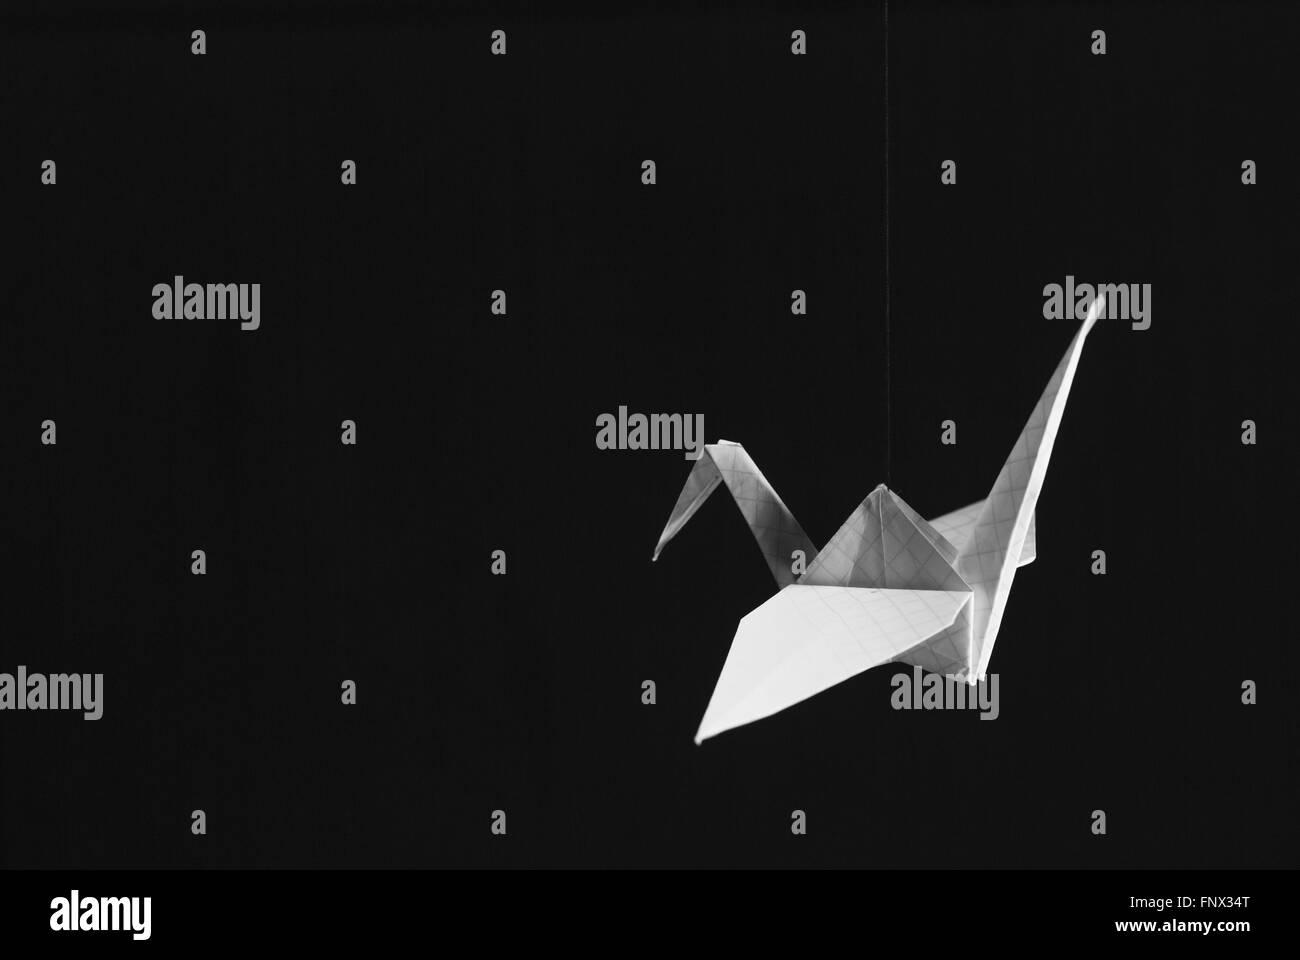 Origami Crane Stock Photos & Origami Crane Stock Images ... - photo#49